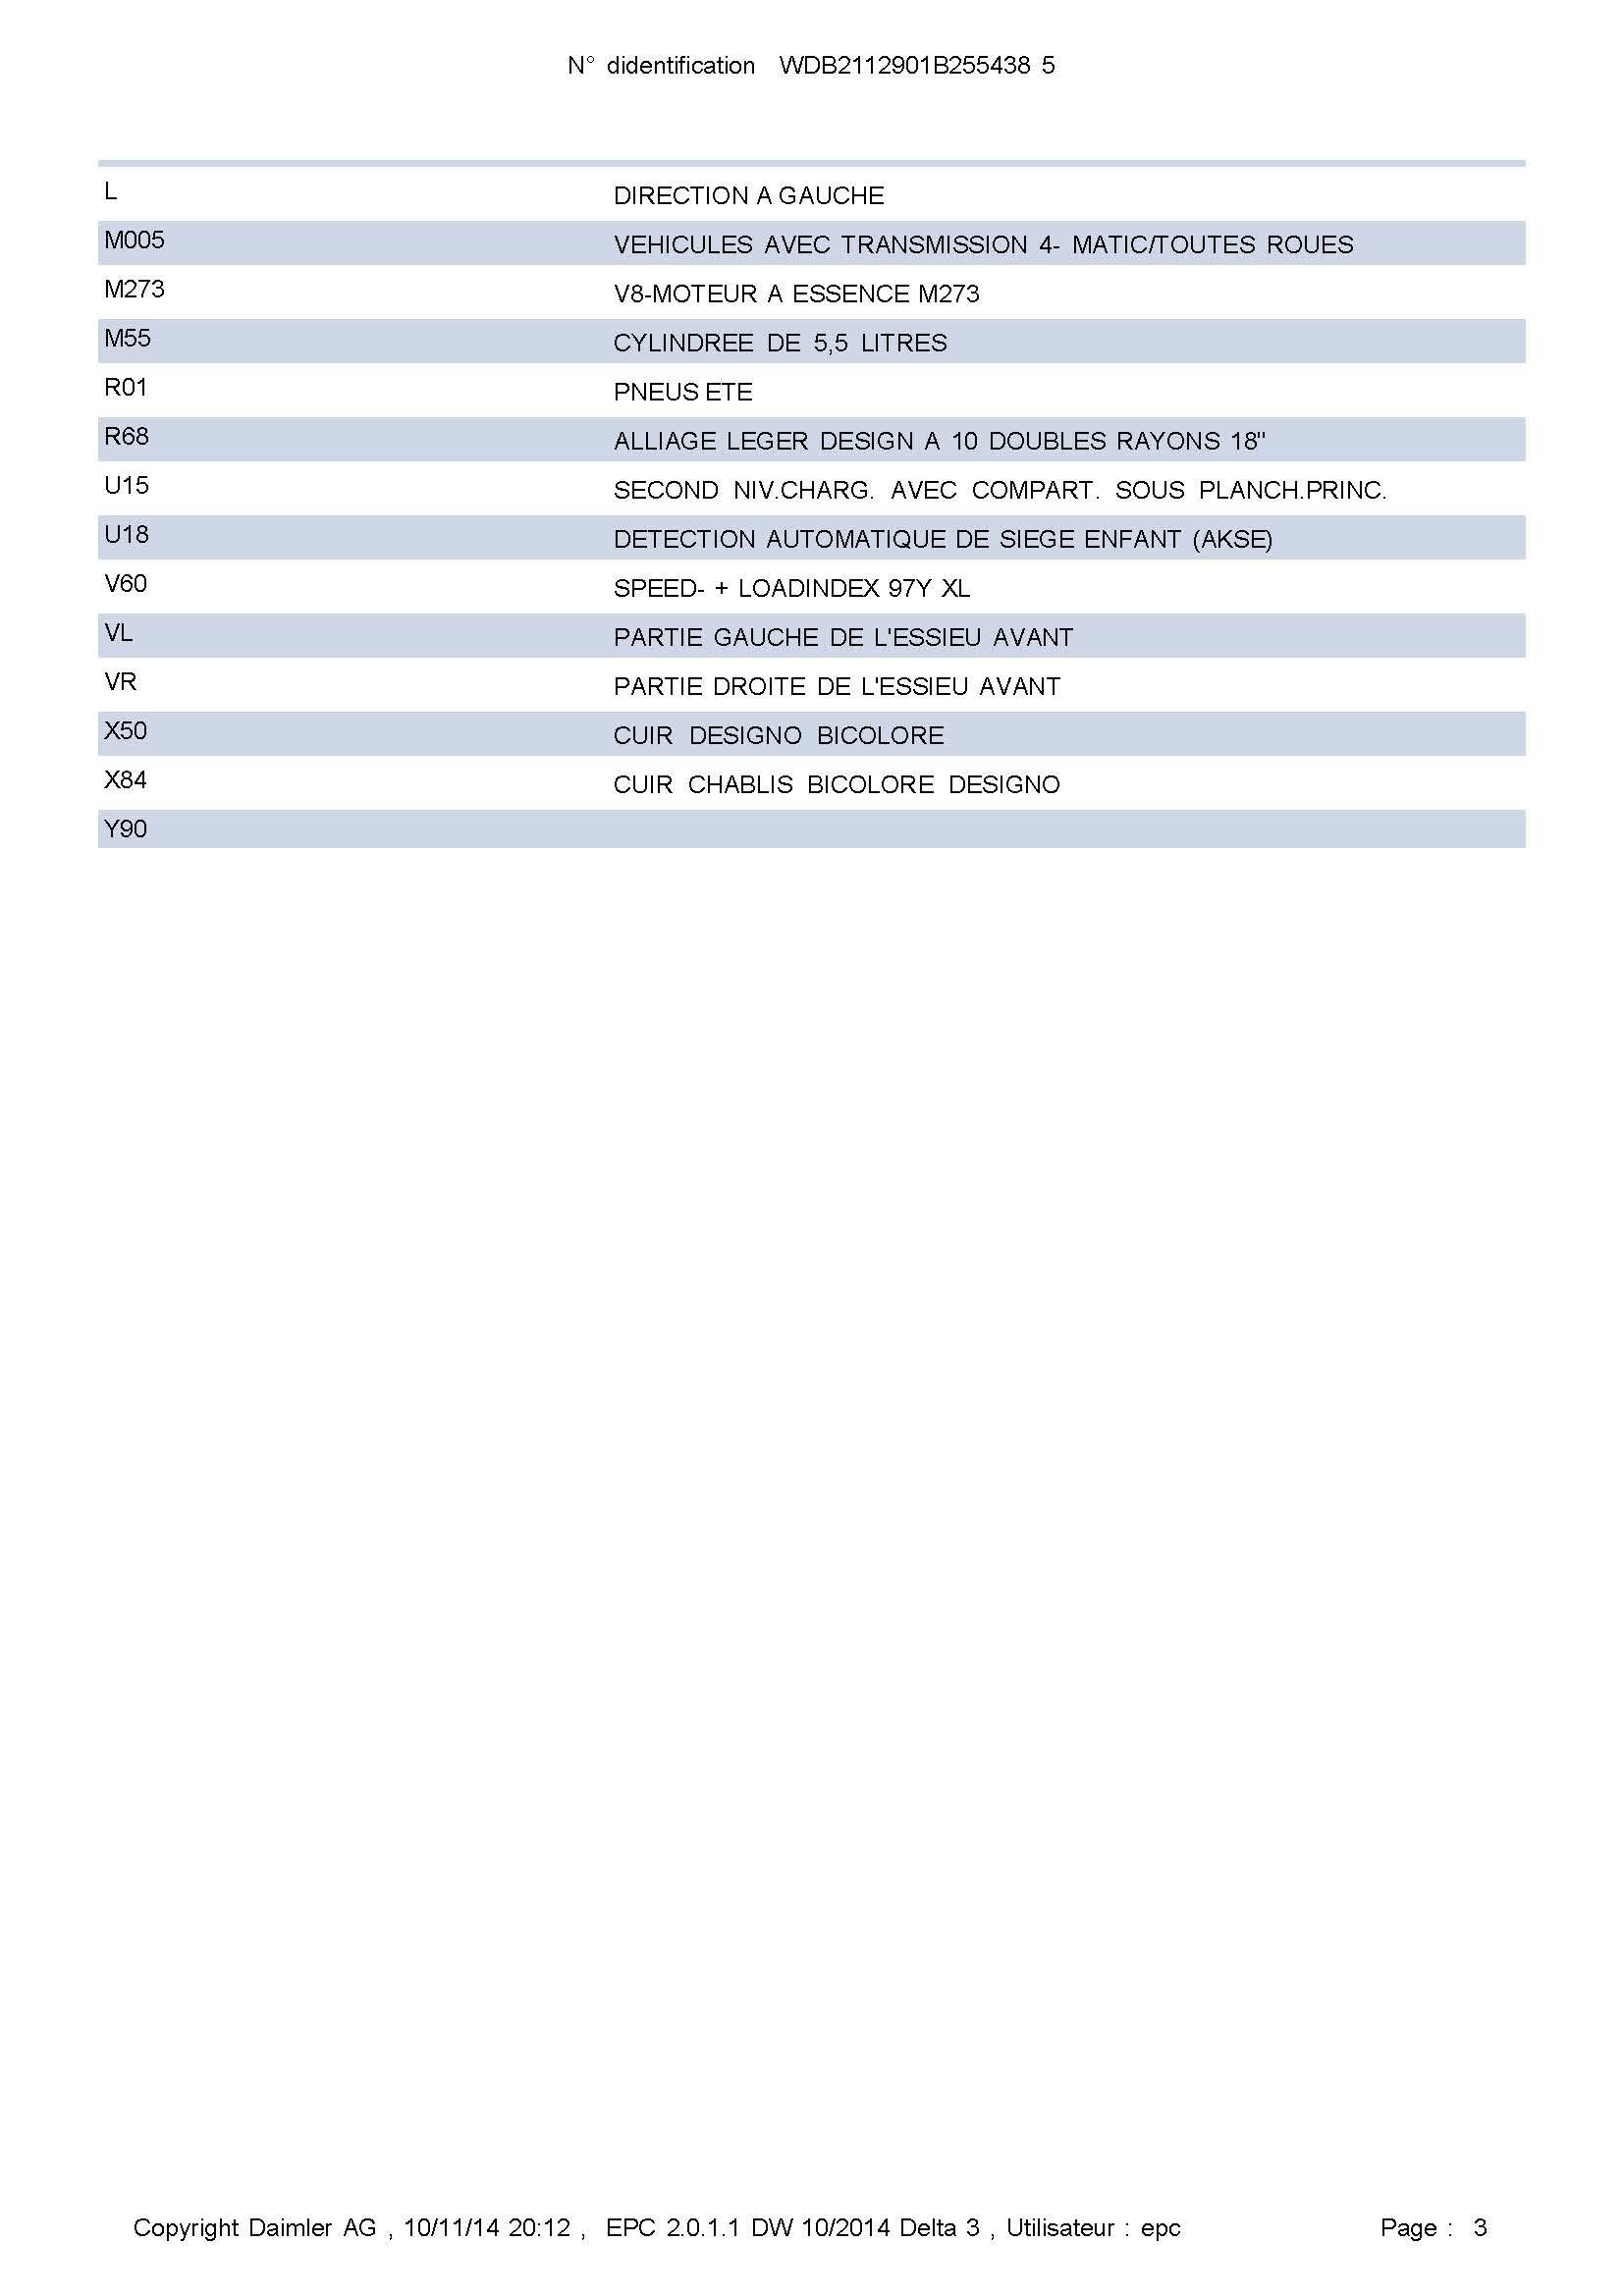 Annonce E500 Break Edition Carlsson 450CH Wdb21114